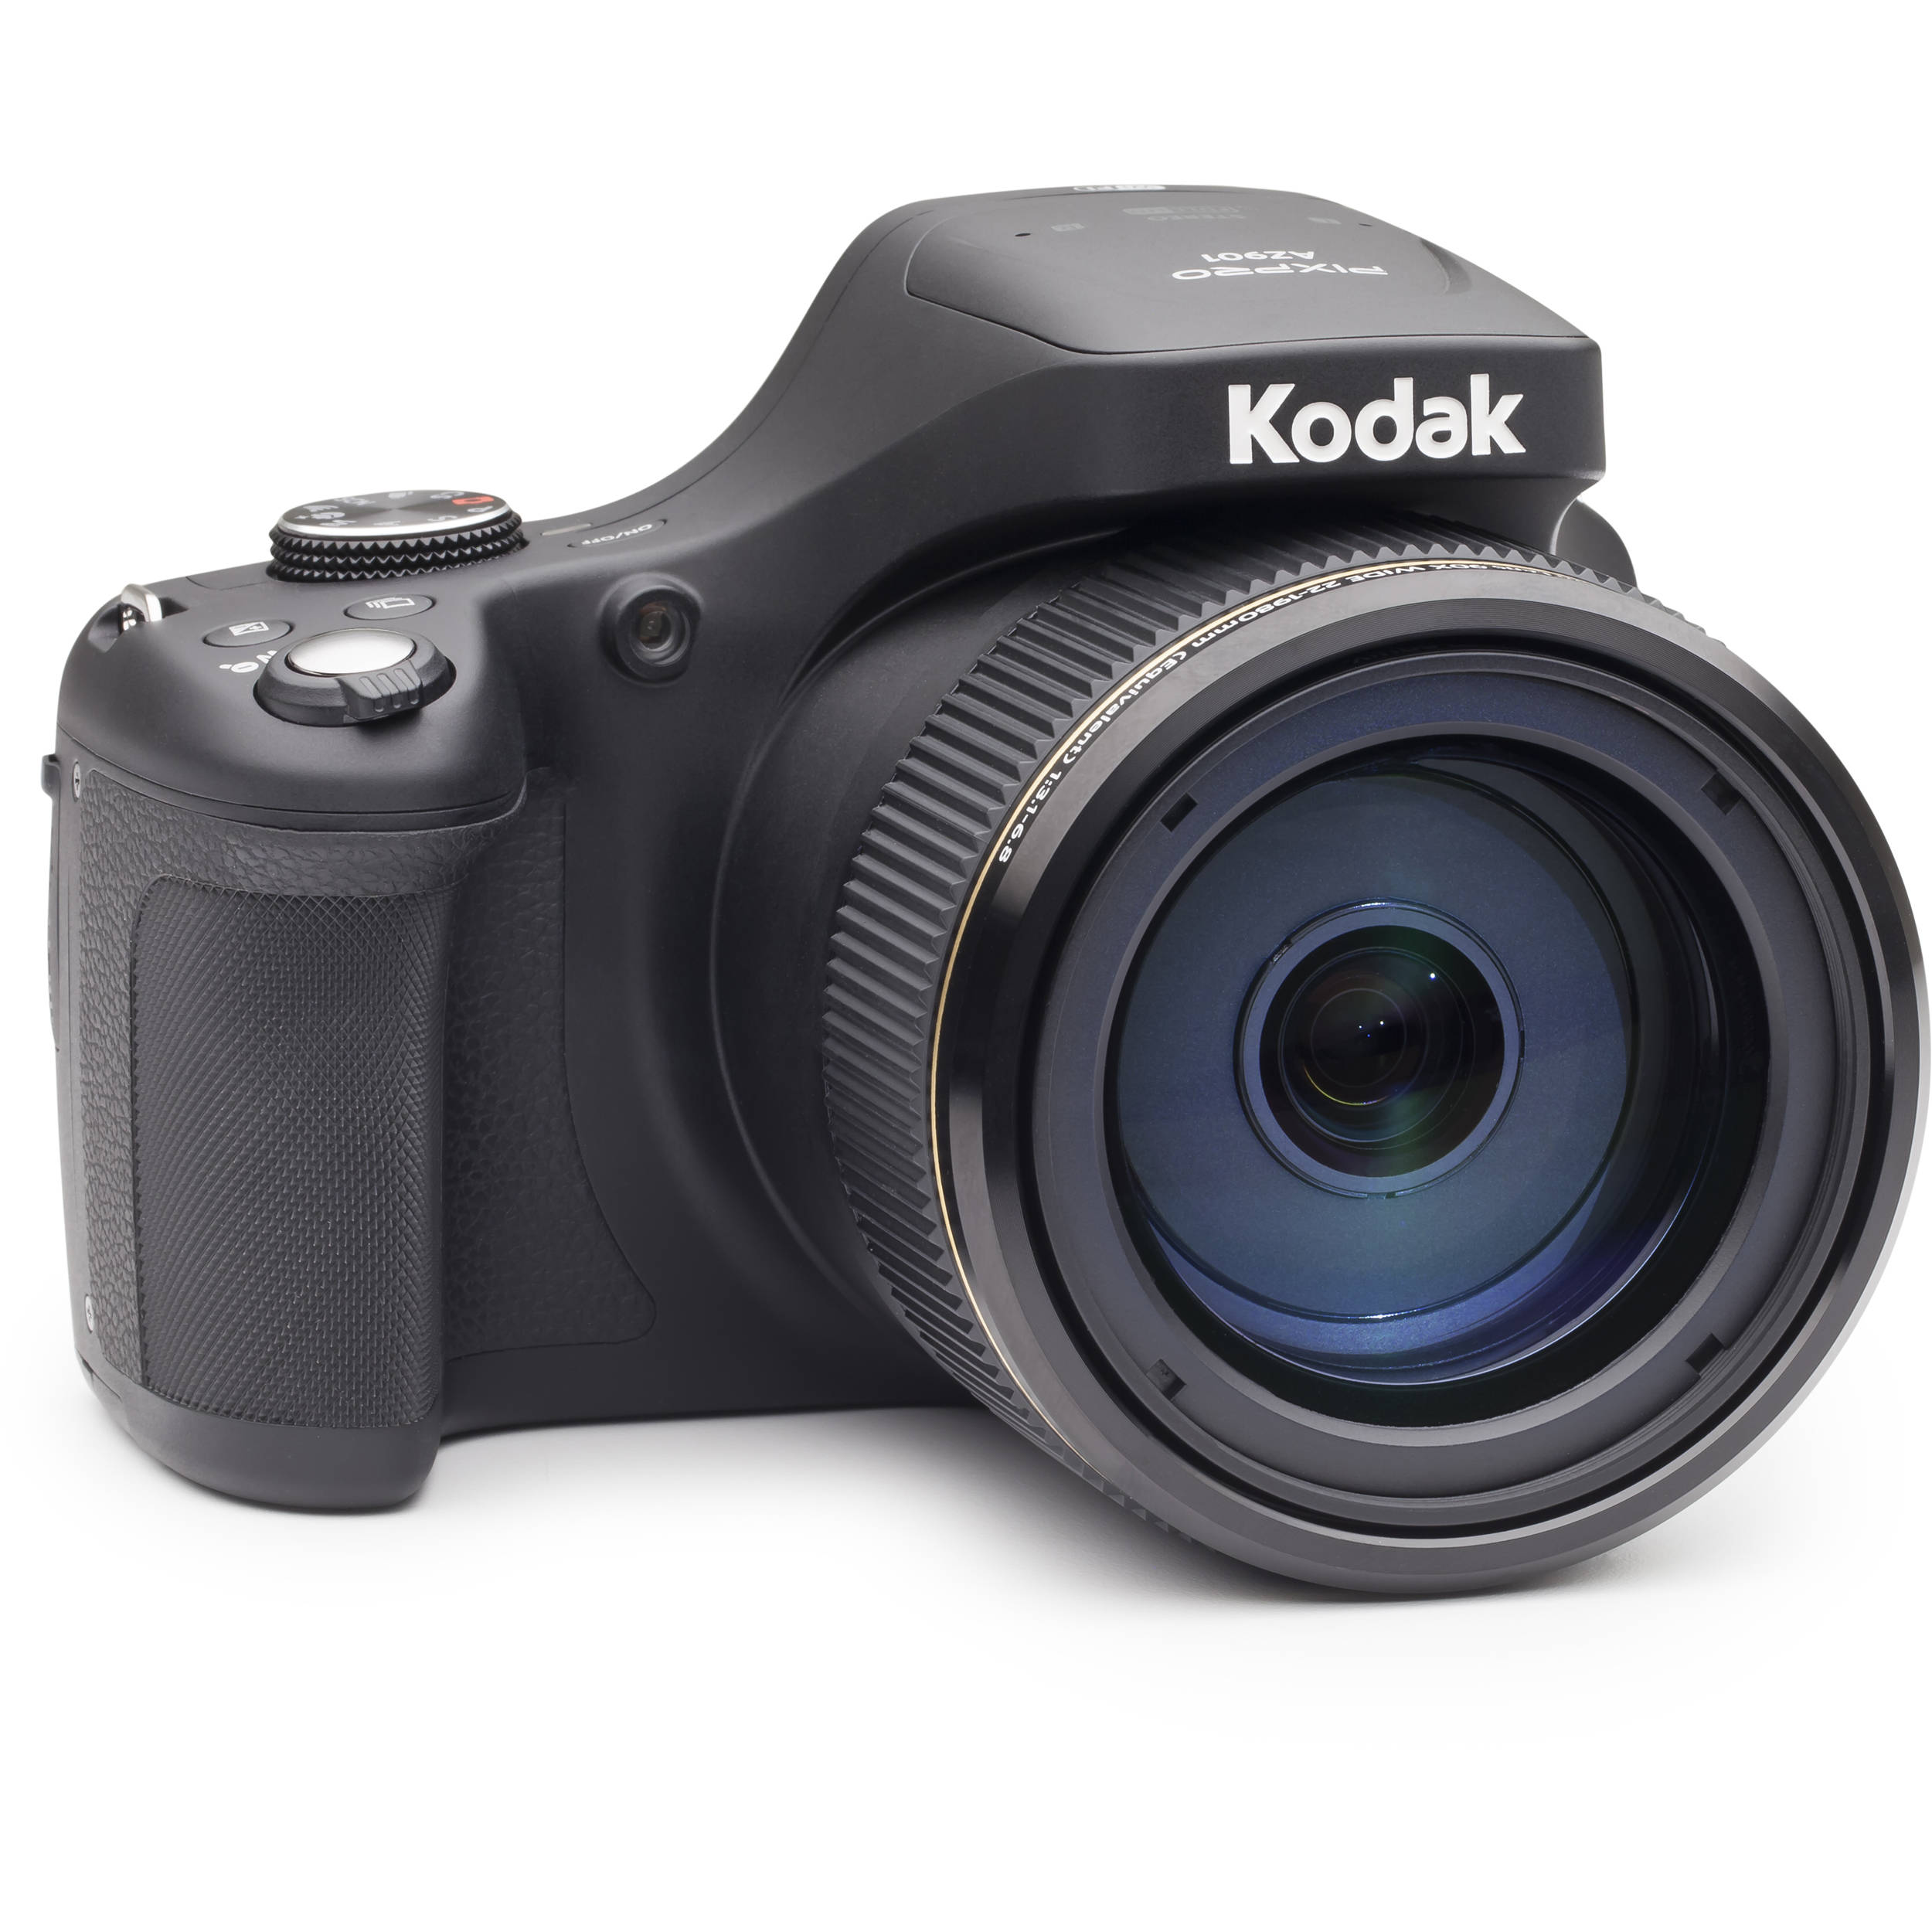 Kodak PIXPRO AZ901 Digital Camera